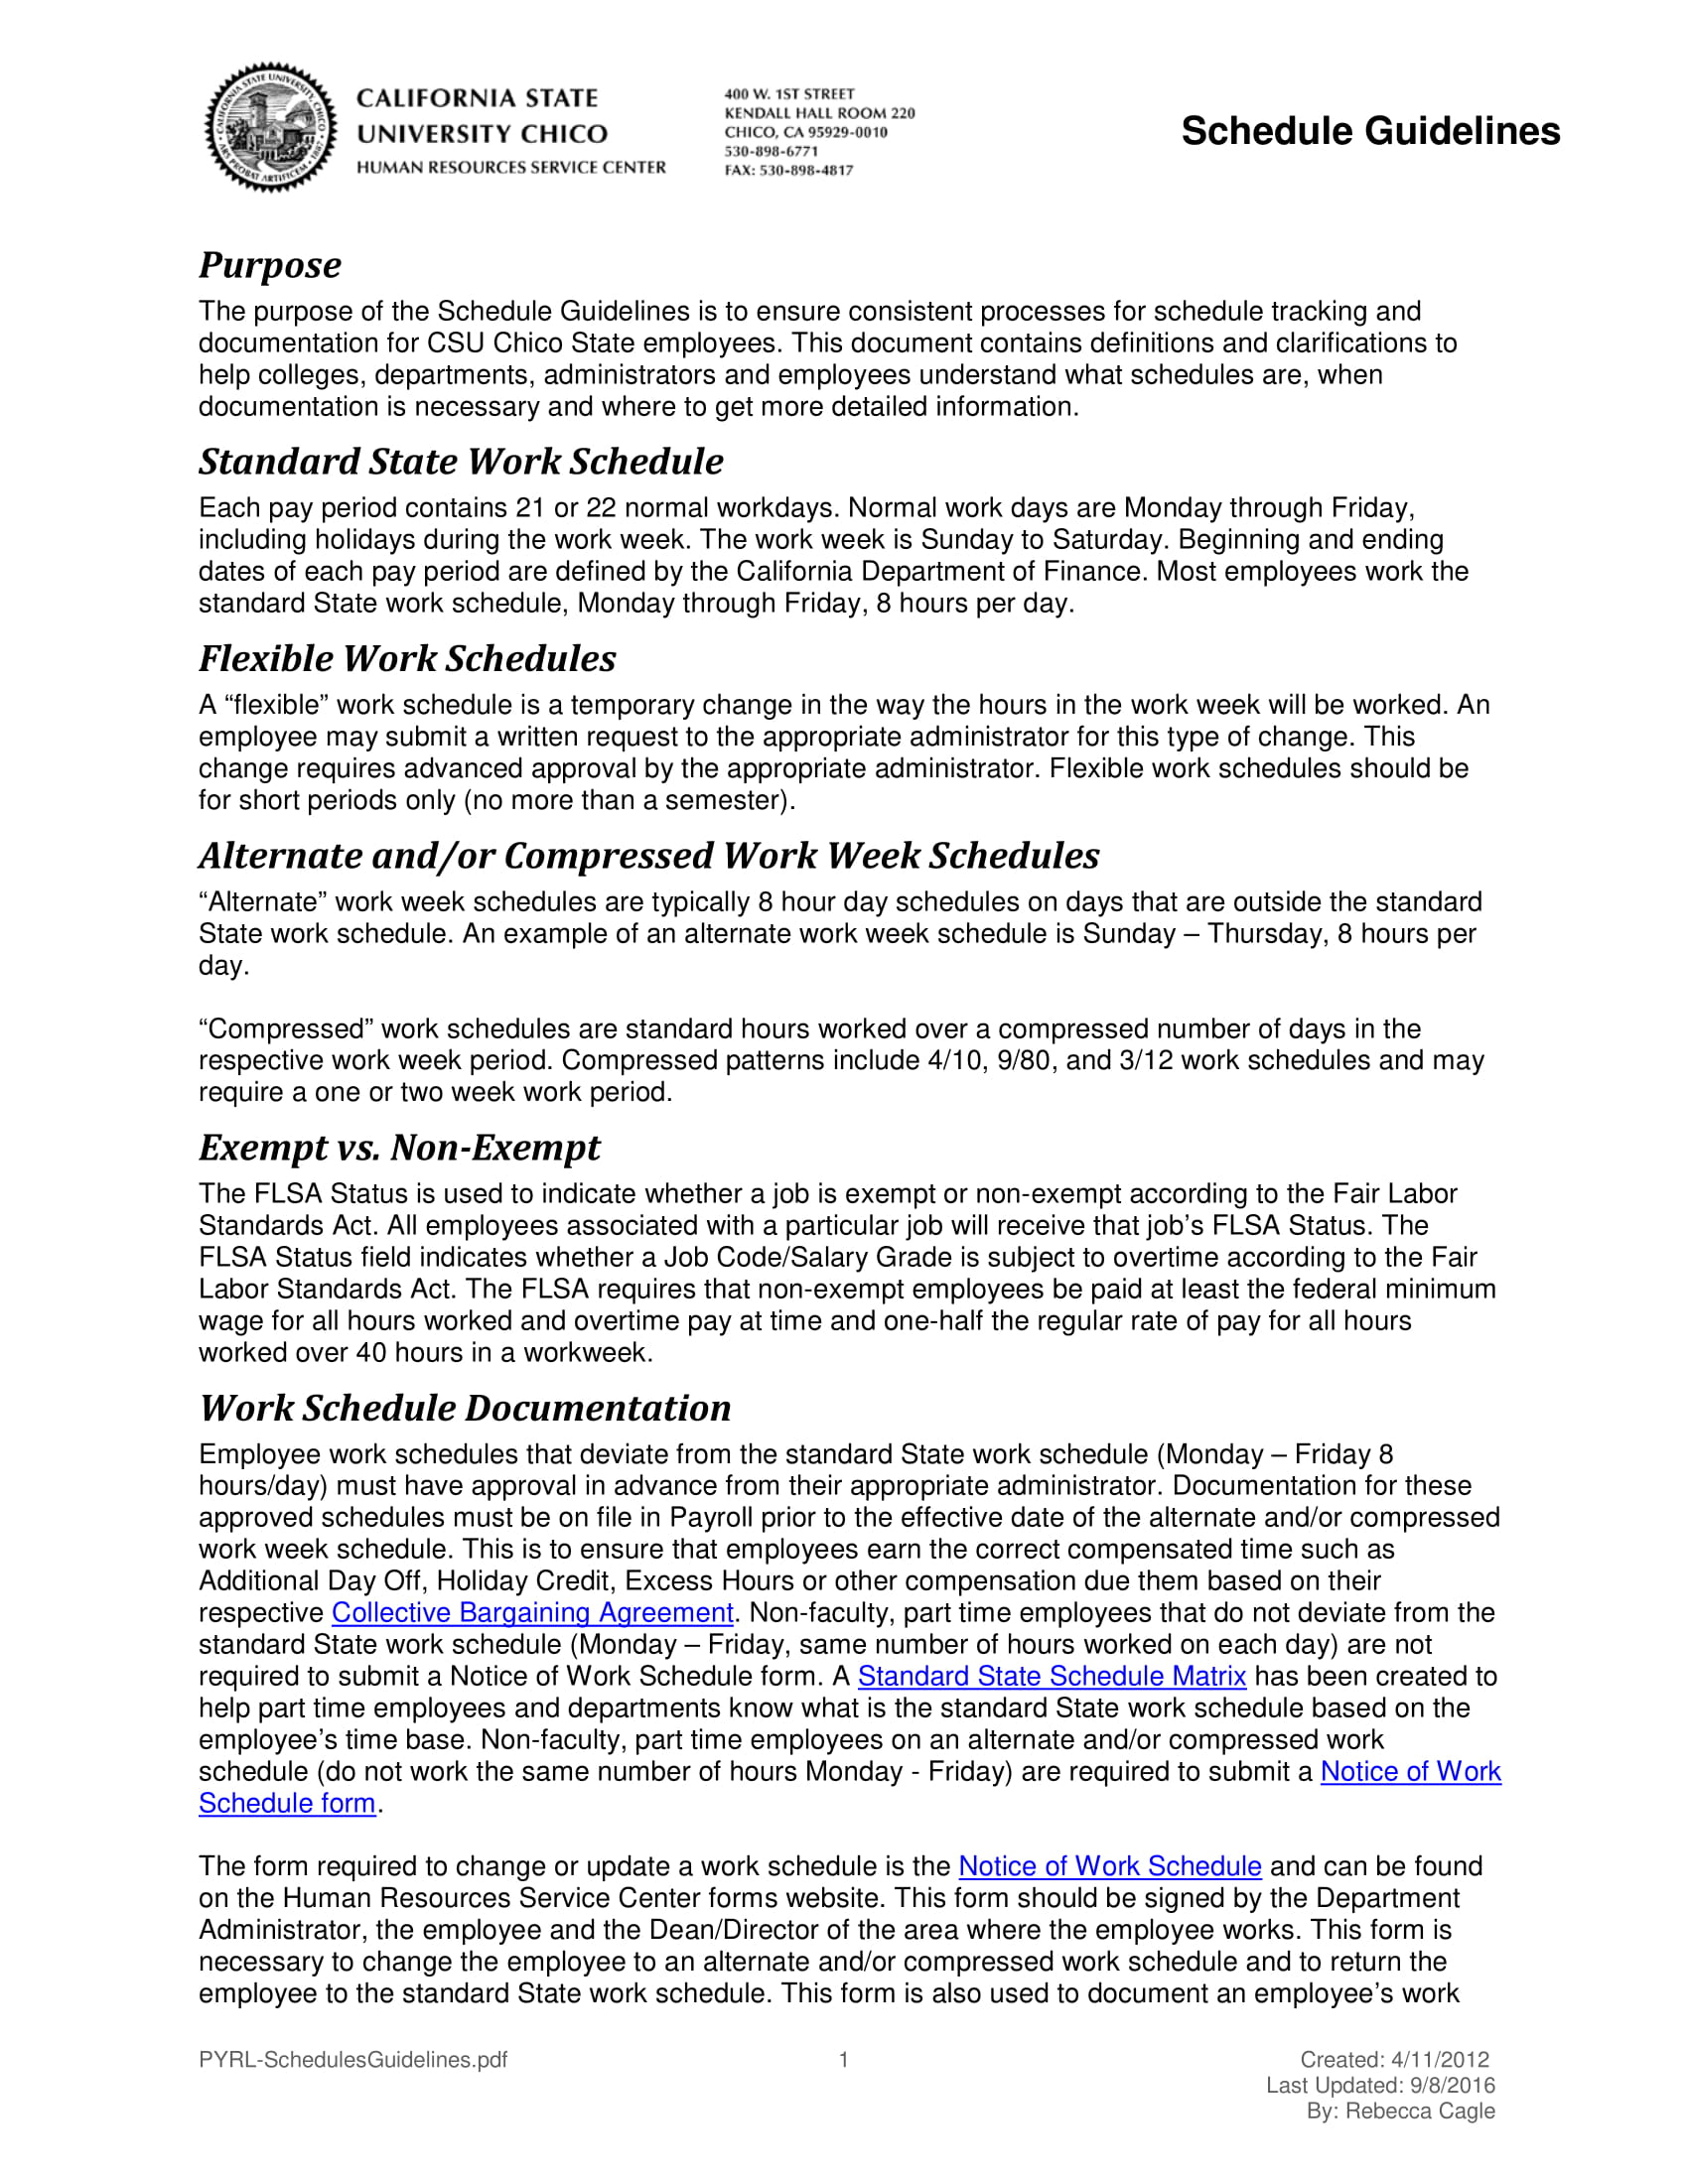 10 employee work schedule examples pdf